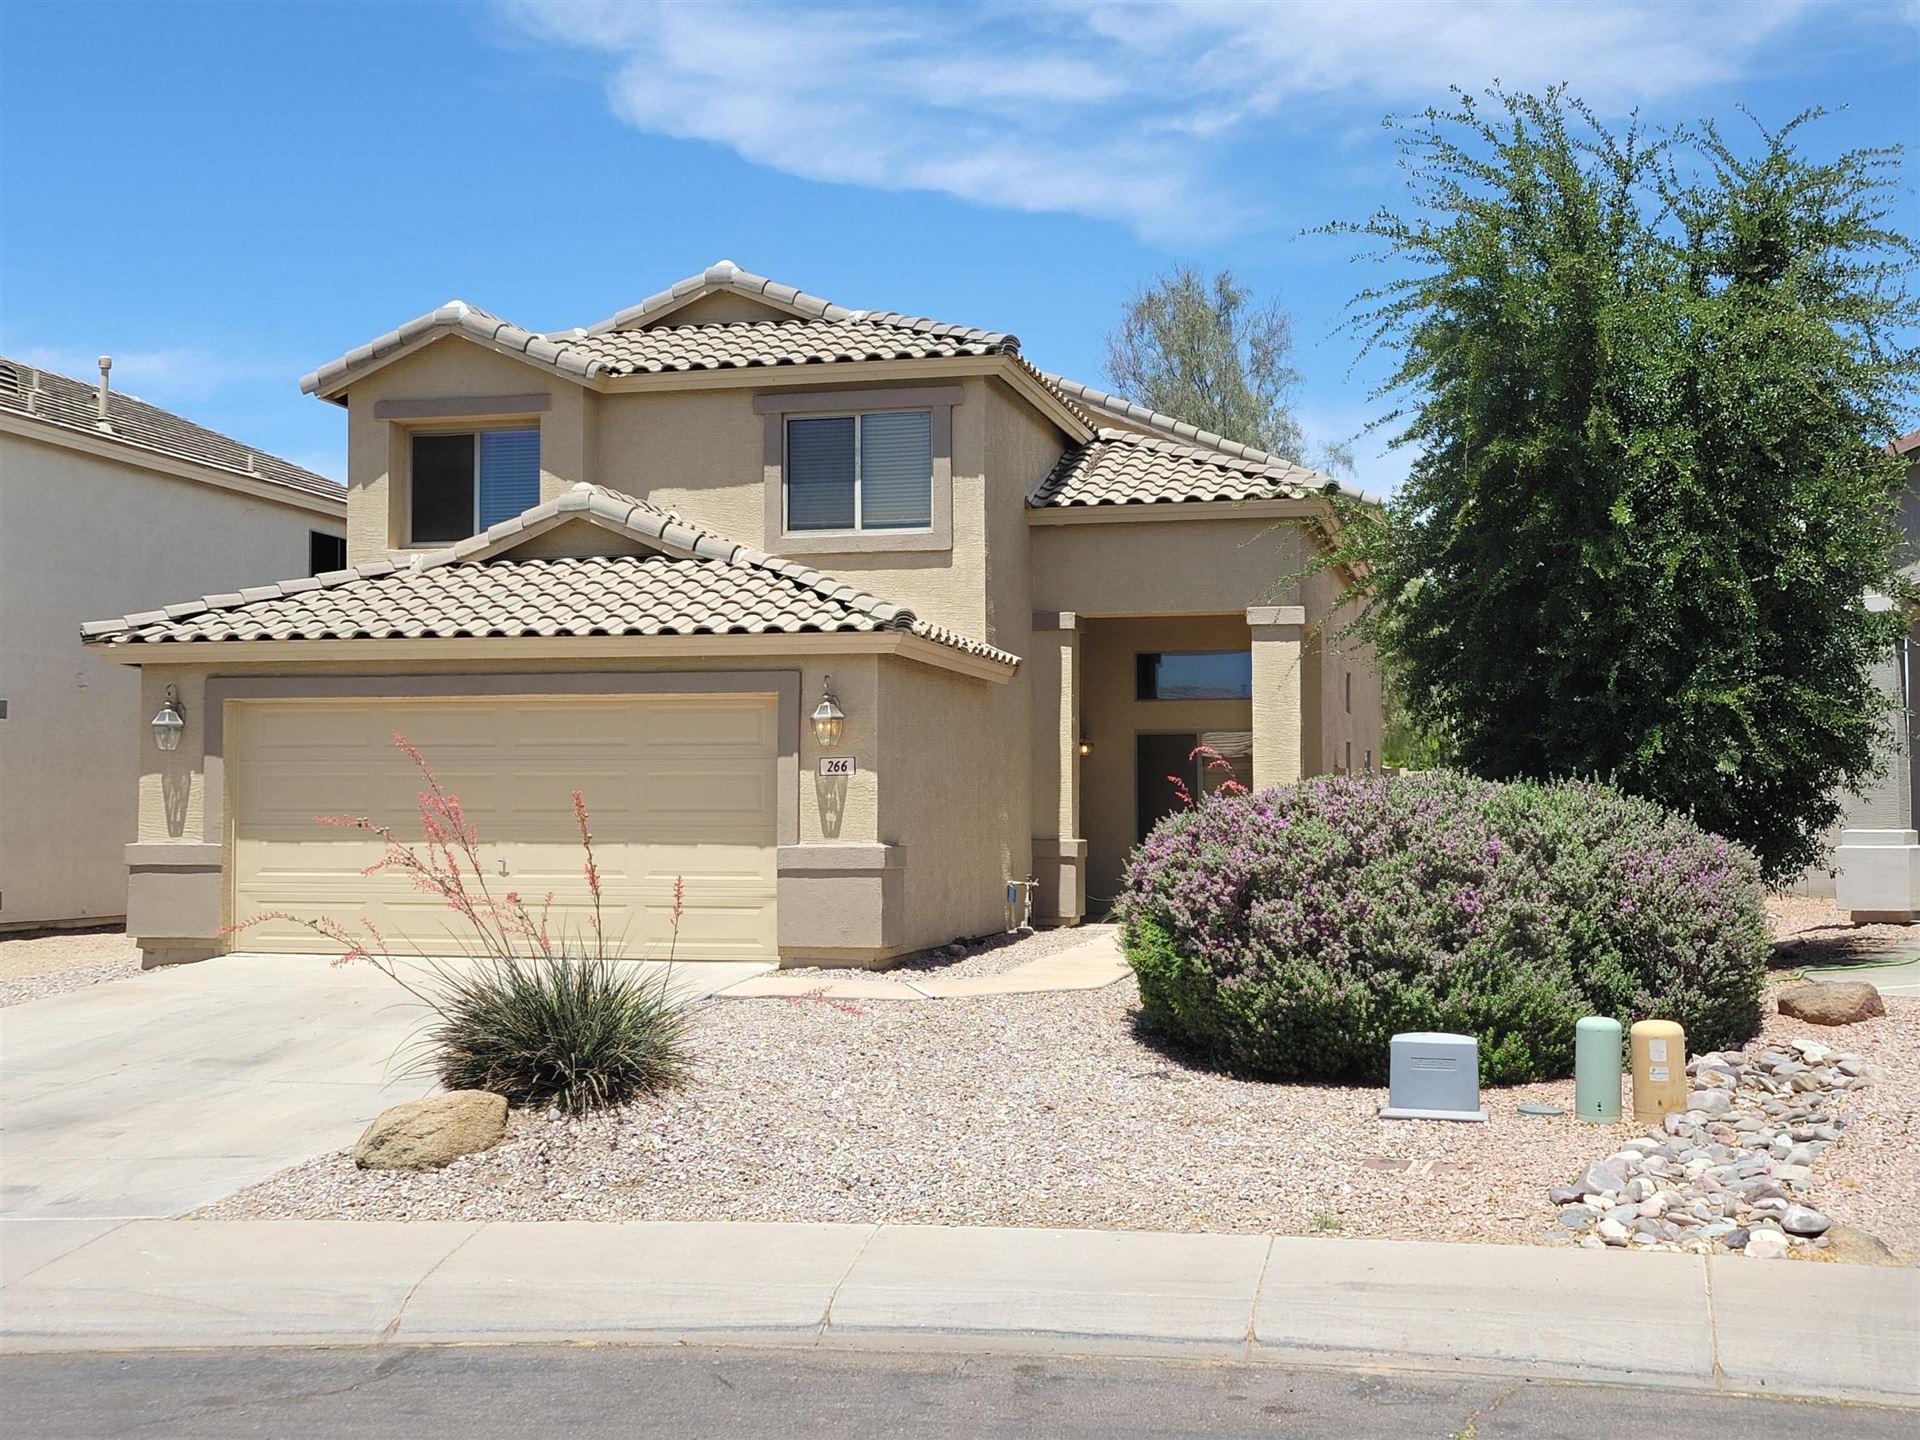 Photo of 266 W HEREFORD Drive, San Tan Valley, AZ 85143 (MLS # 6232239)